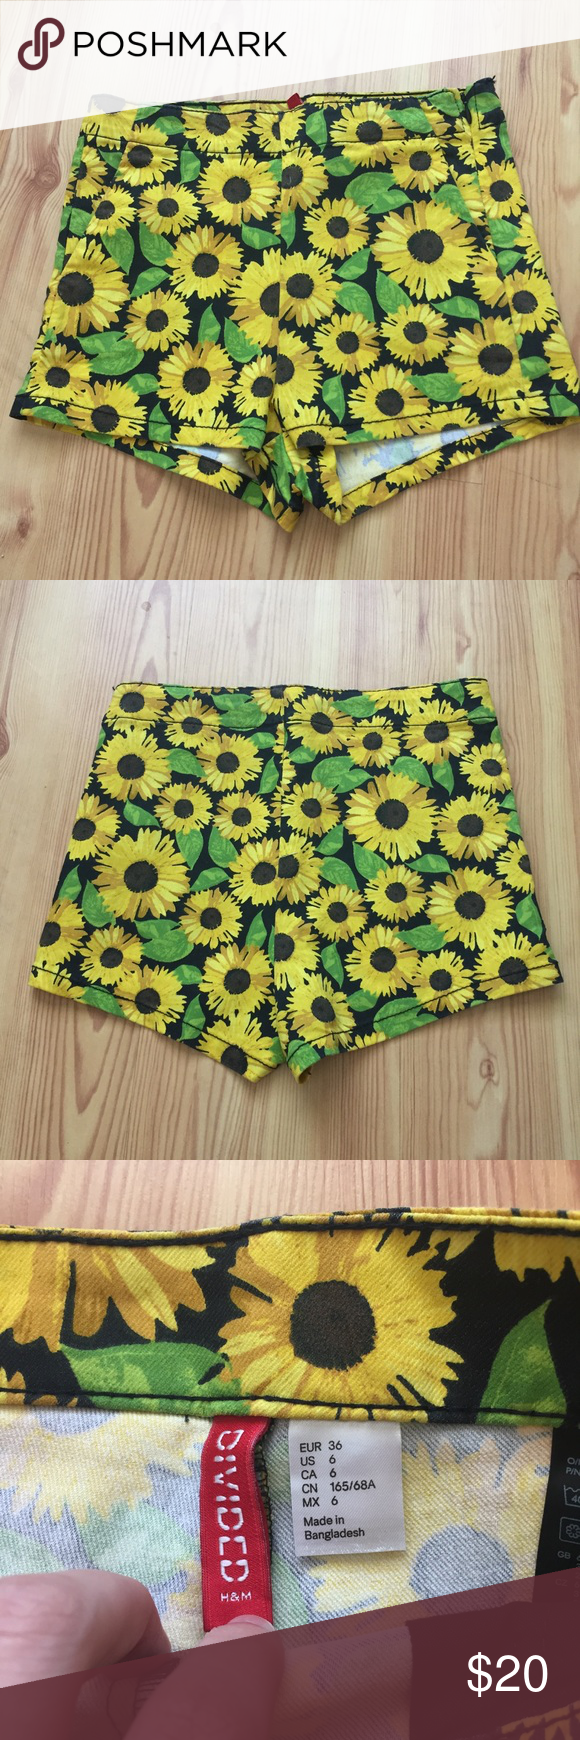 H&M Sunflower Shorts B10 Super cute sunflower 🌻 shorts in ...